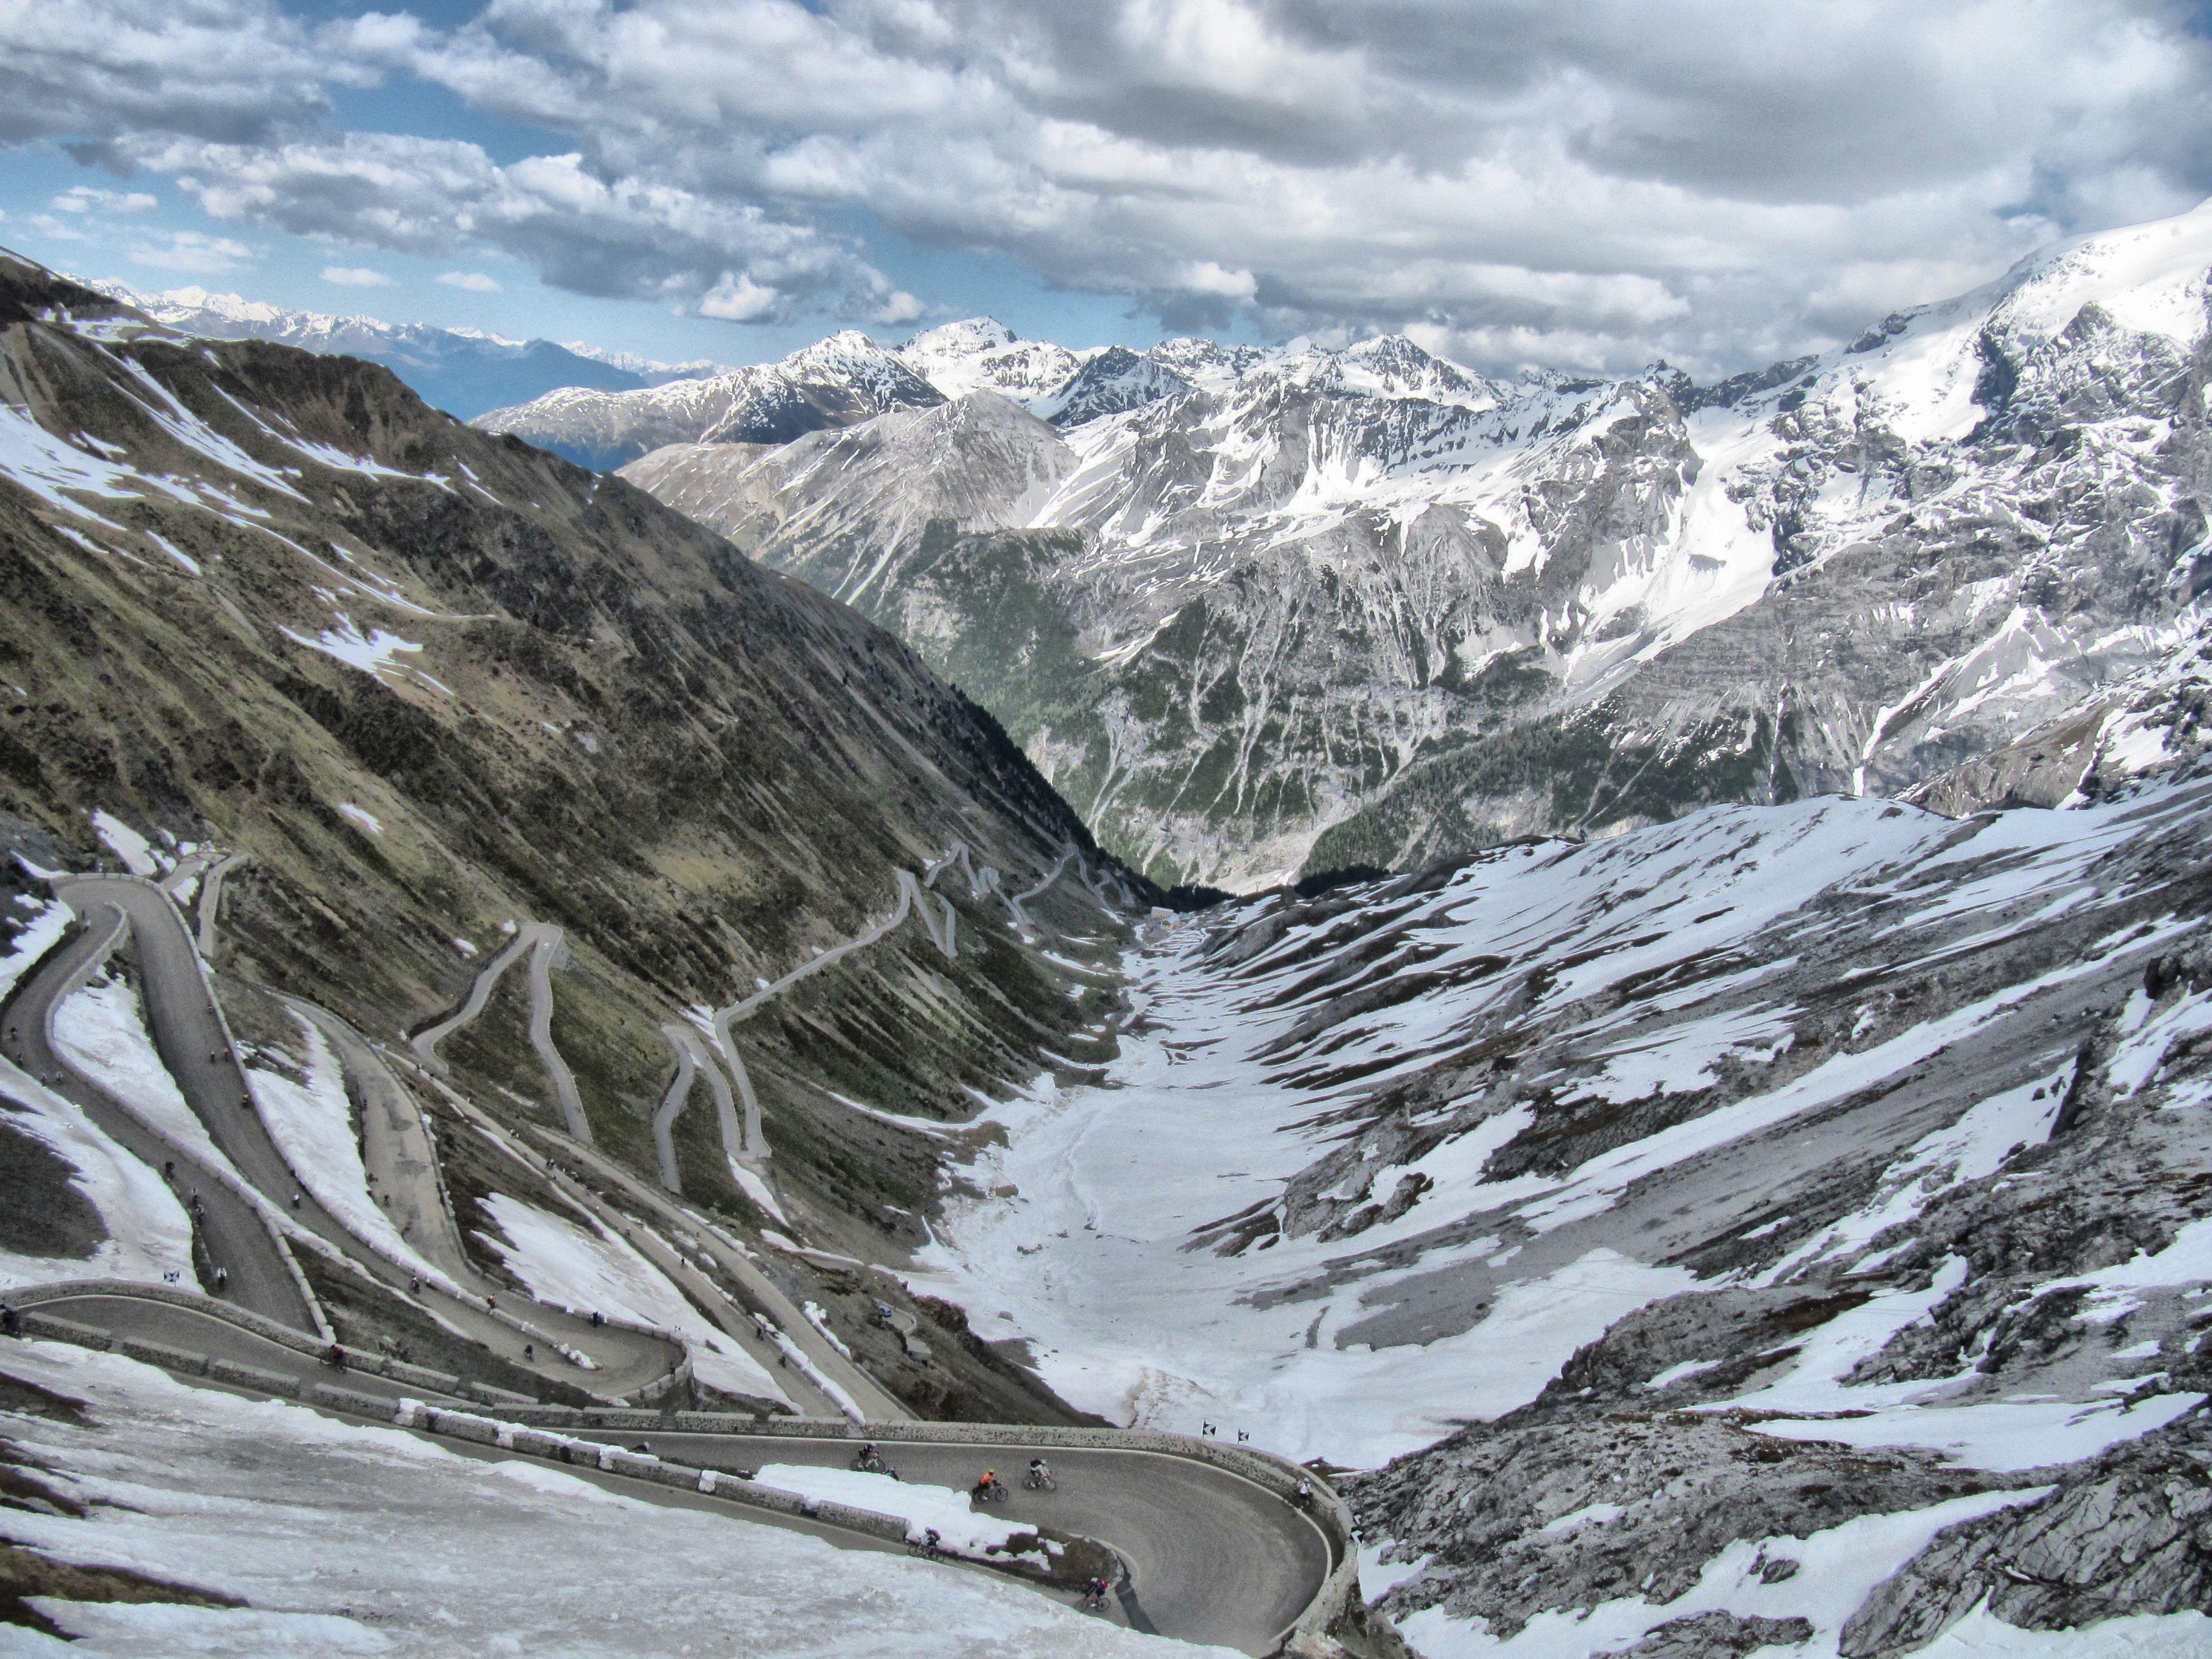 The Stelvio Pass In 2020 Bike Experience Bike Rental Excursions